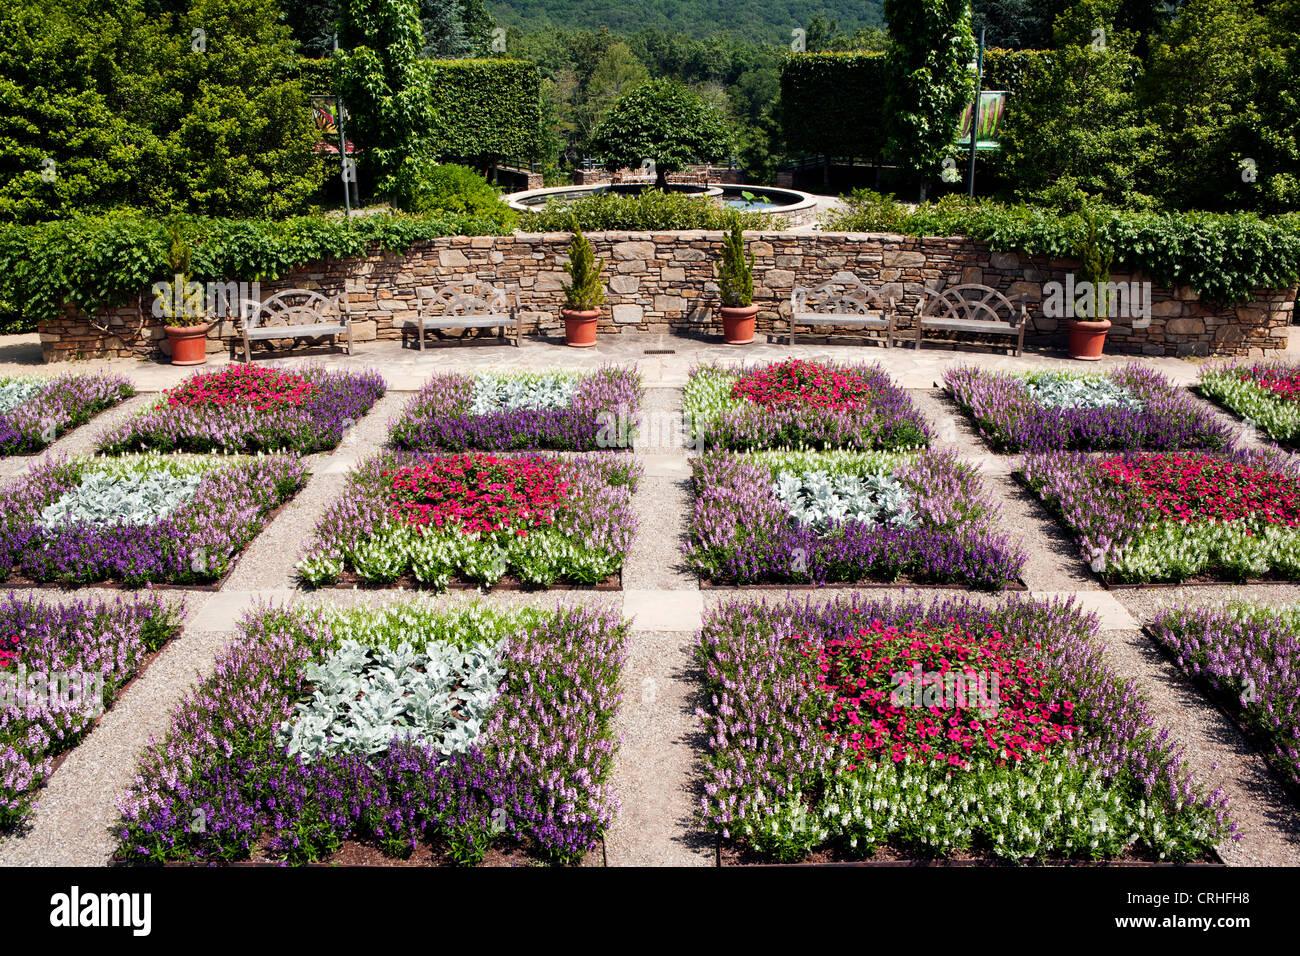 Quilt Garden - North Carolina Arboretum - Asheville, North Carolina, USA - Stock Image